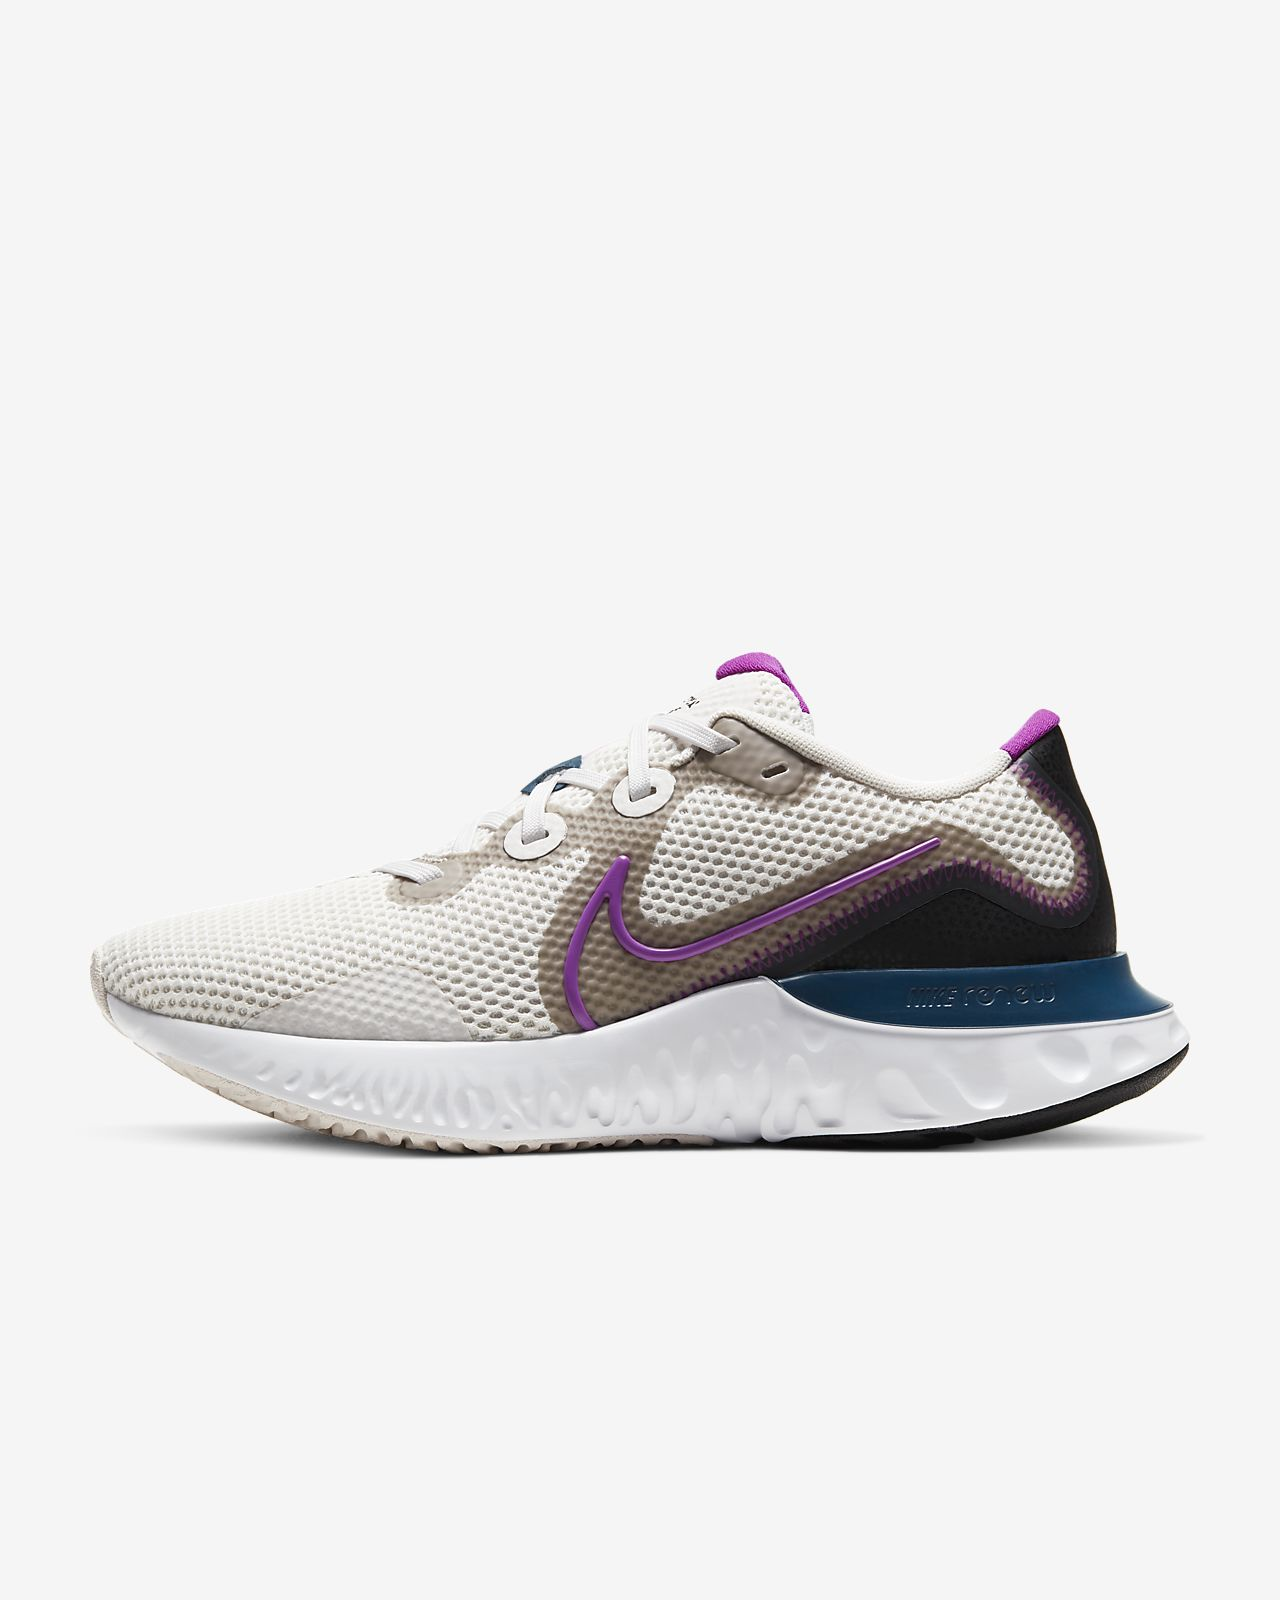 upcoming nike running shoes, Nike Performance FREE TR FOCUS